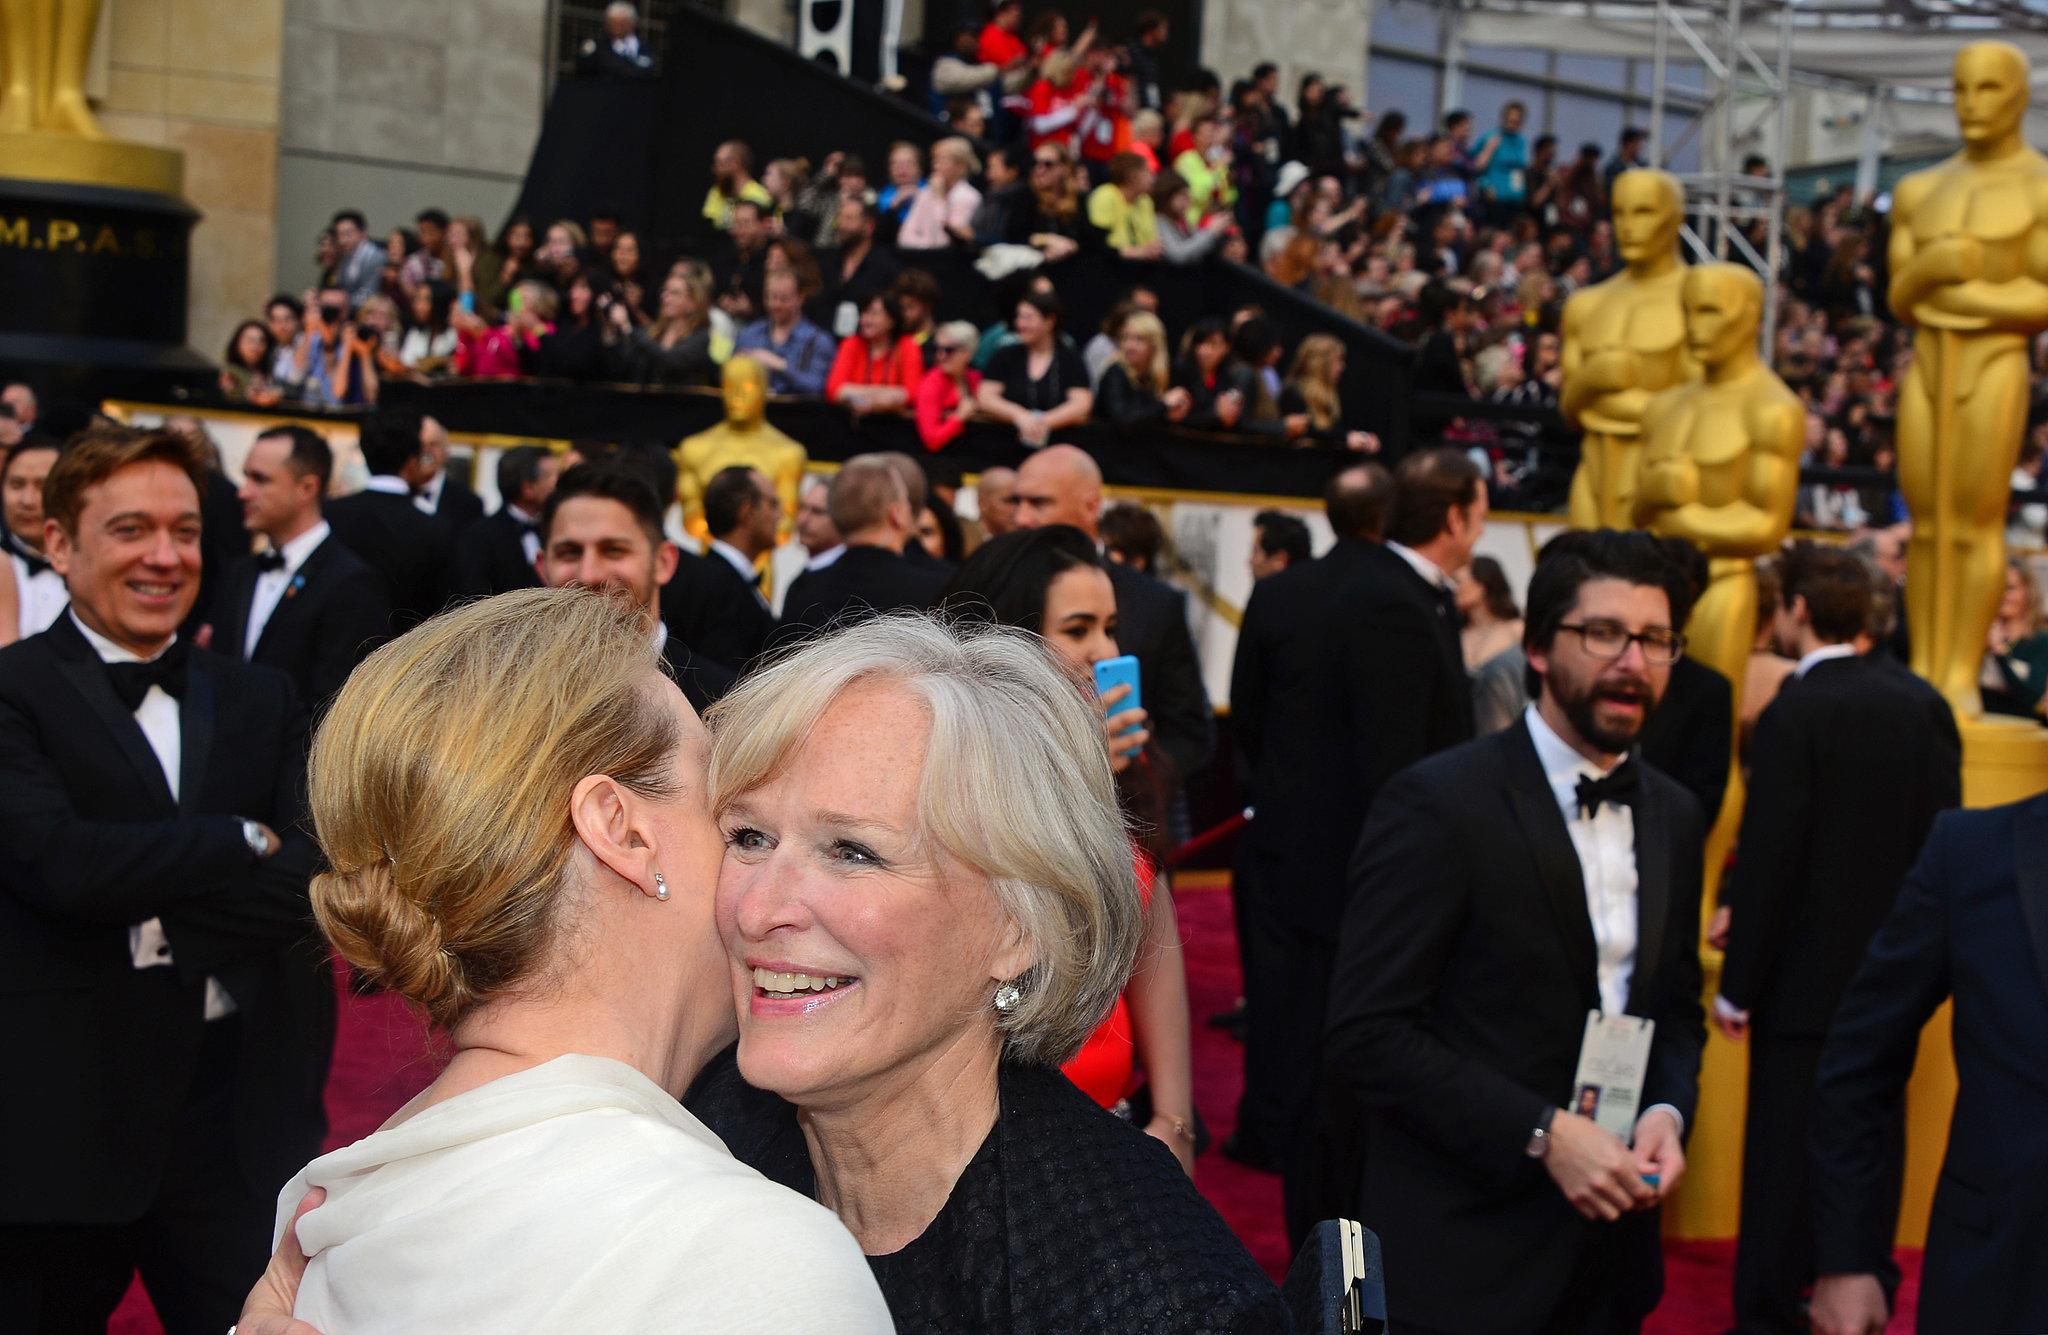 Meryl Streep and Glenn Close embraced on the Oscars red carpet.